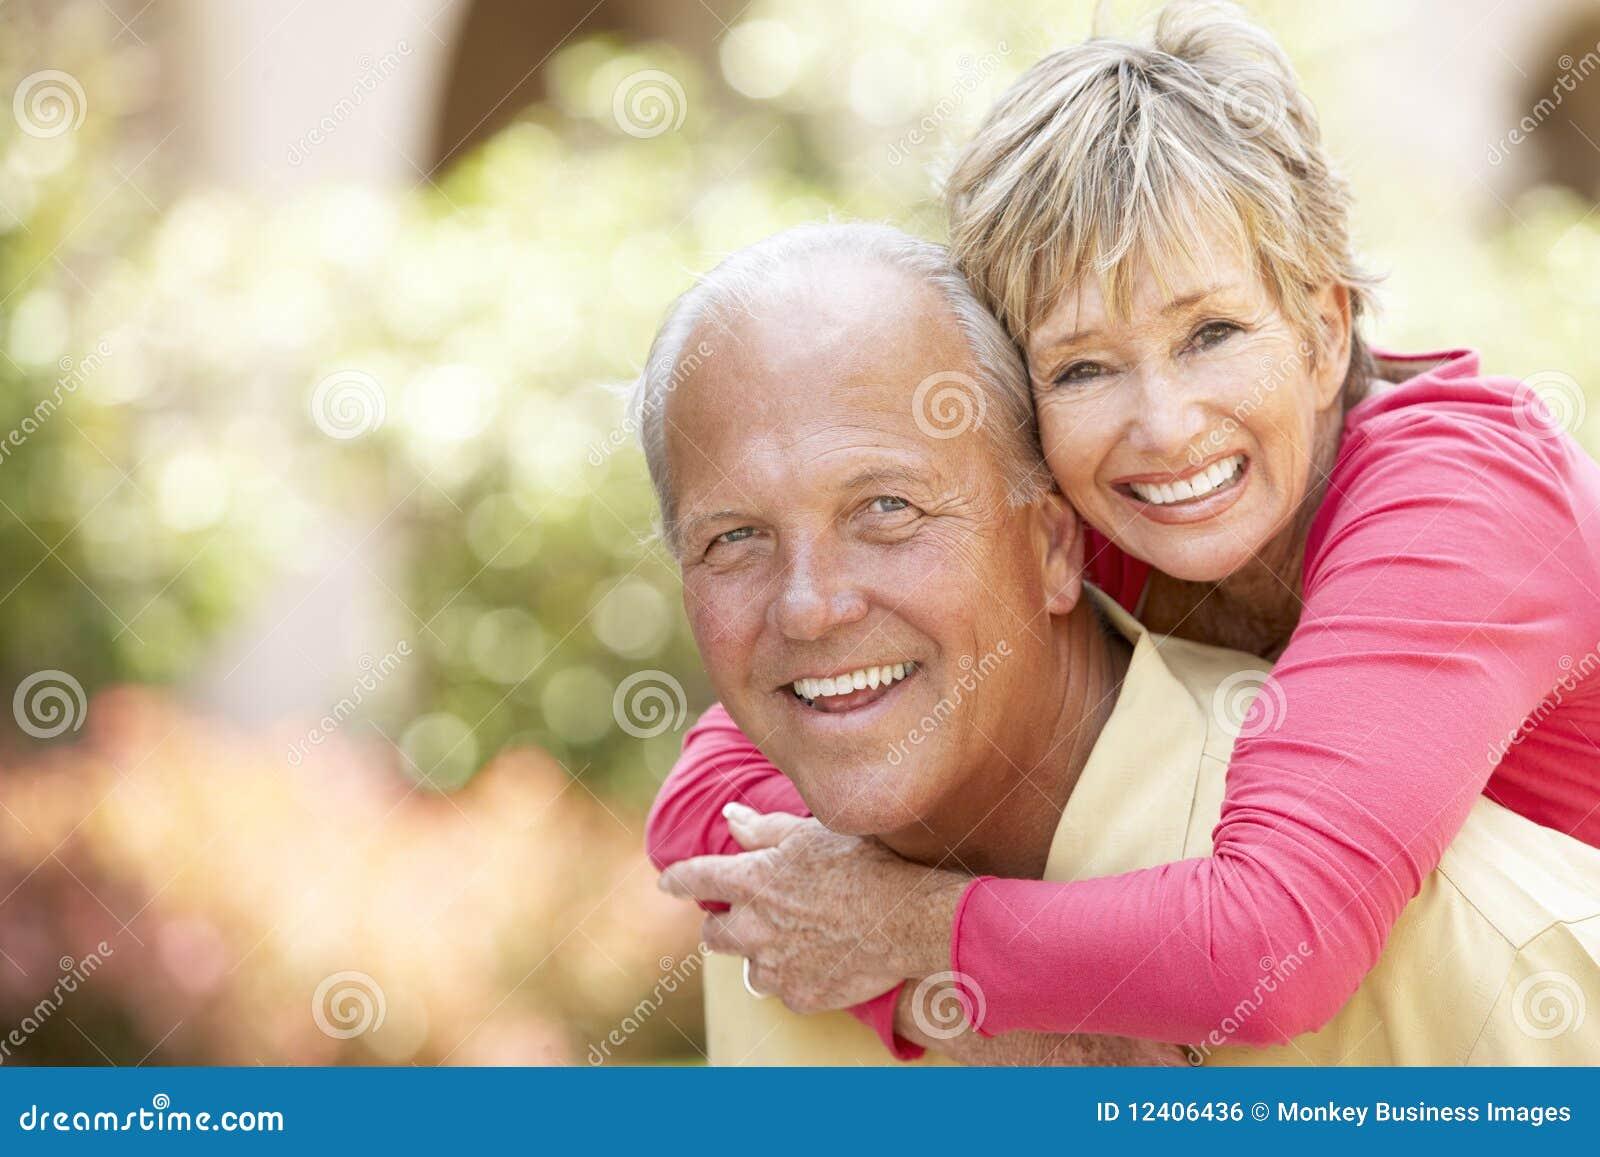 Senior Couple Having Fun In City